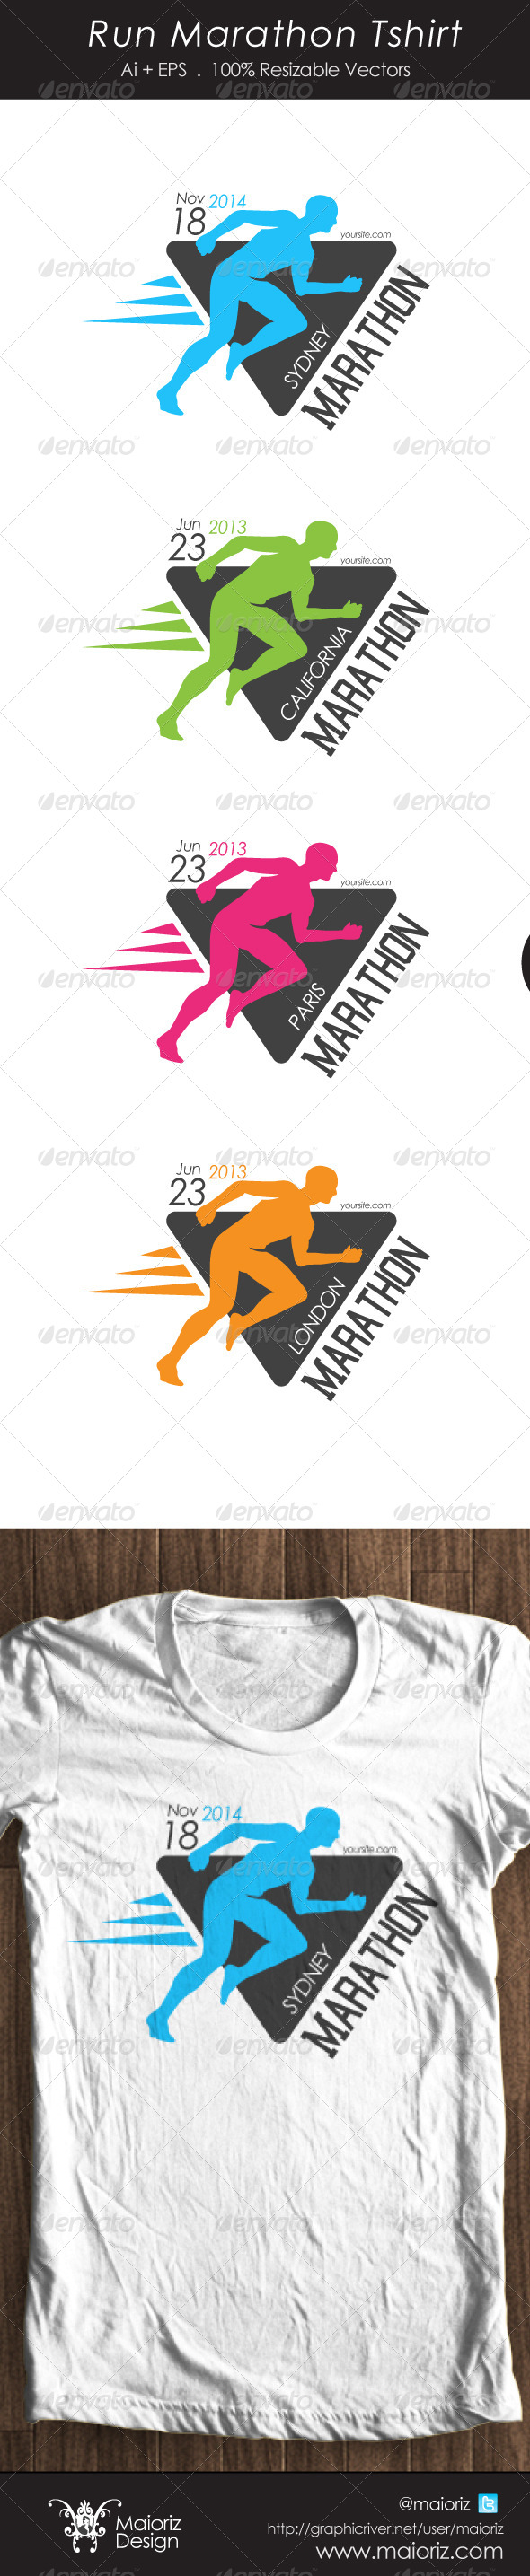 GraphicRiver Run Marathon Tshirt 4525784